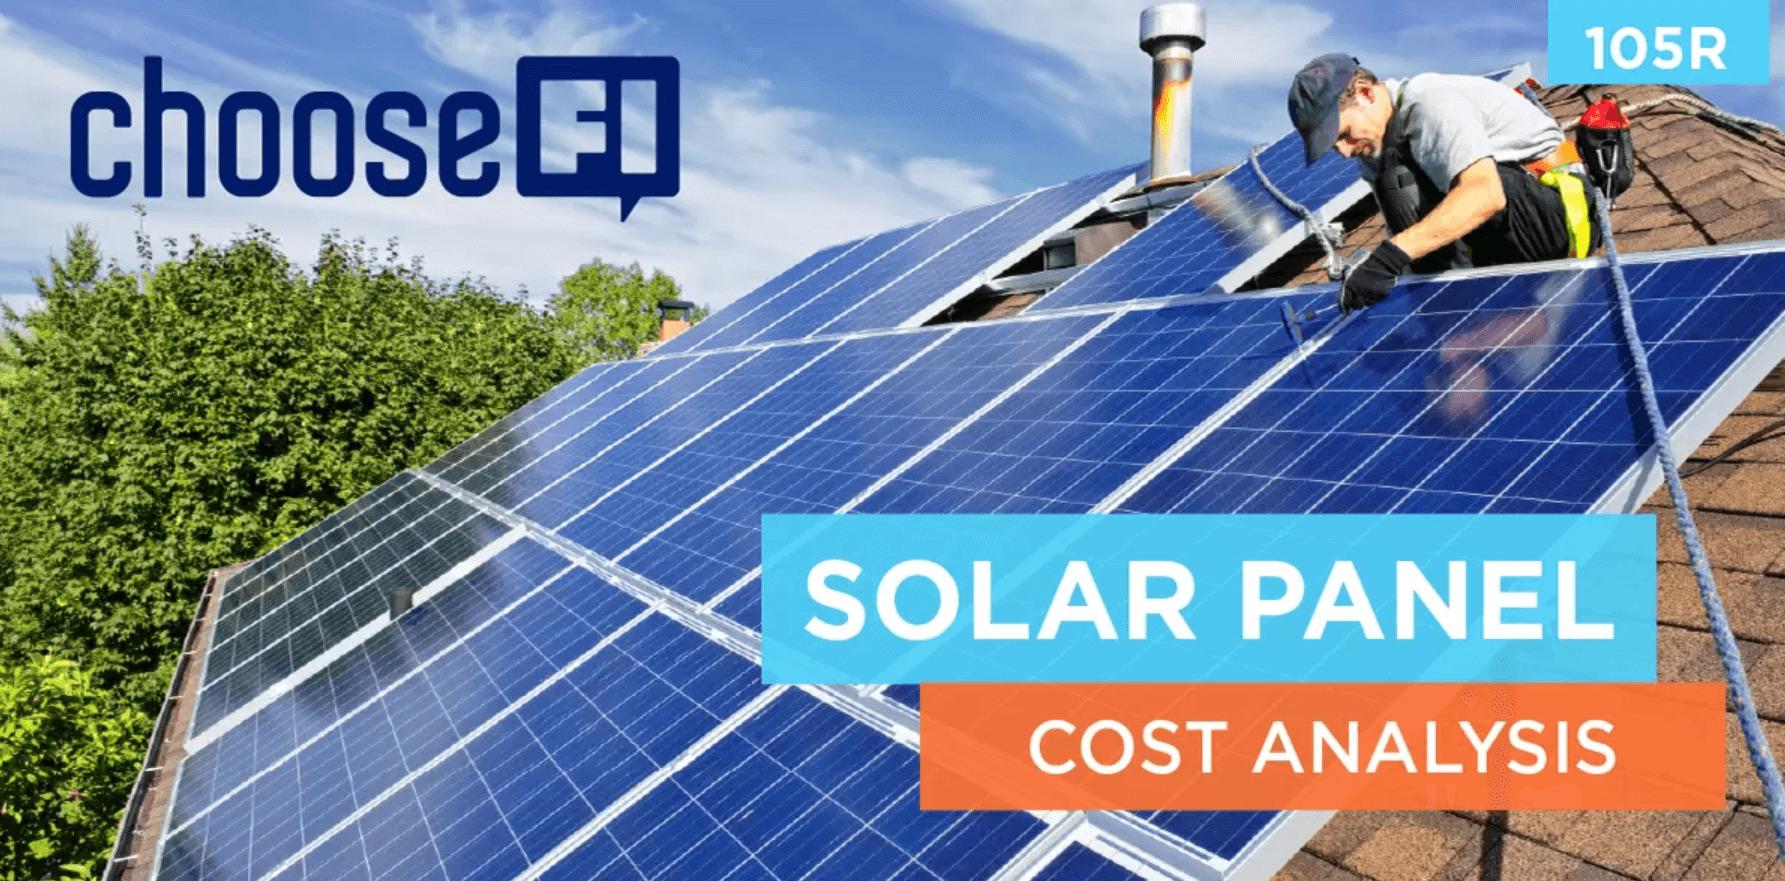 105r Solar Panel Cost Analysis Choosefi